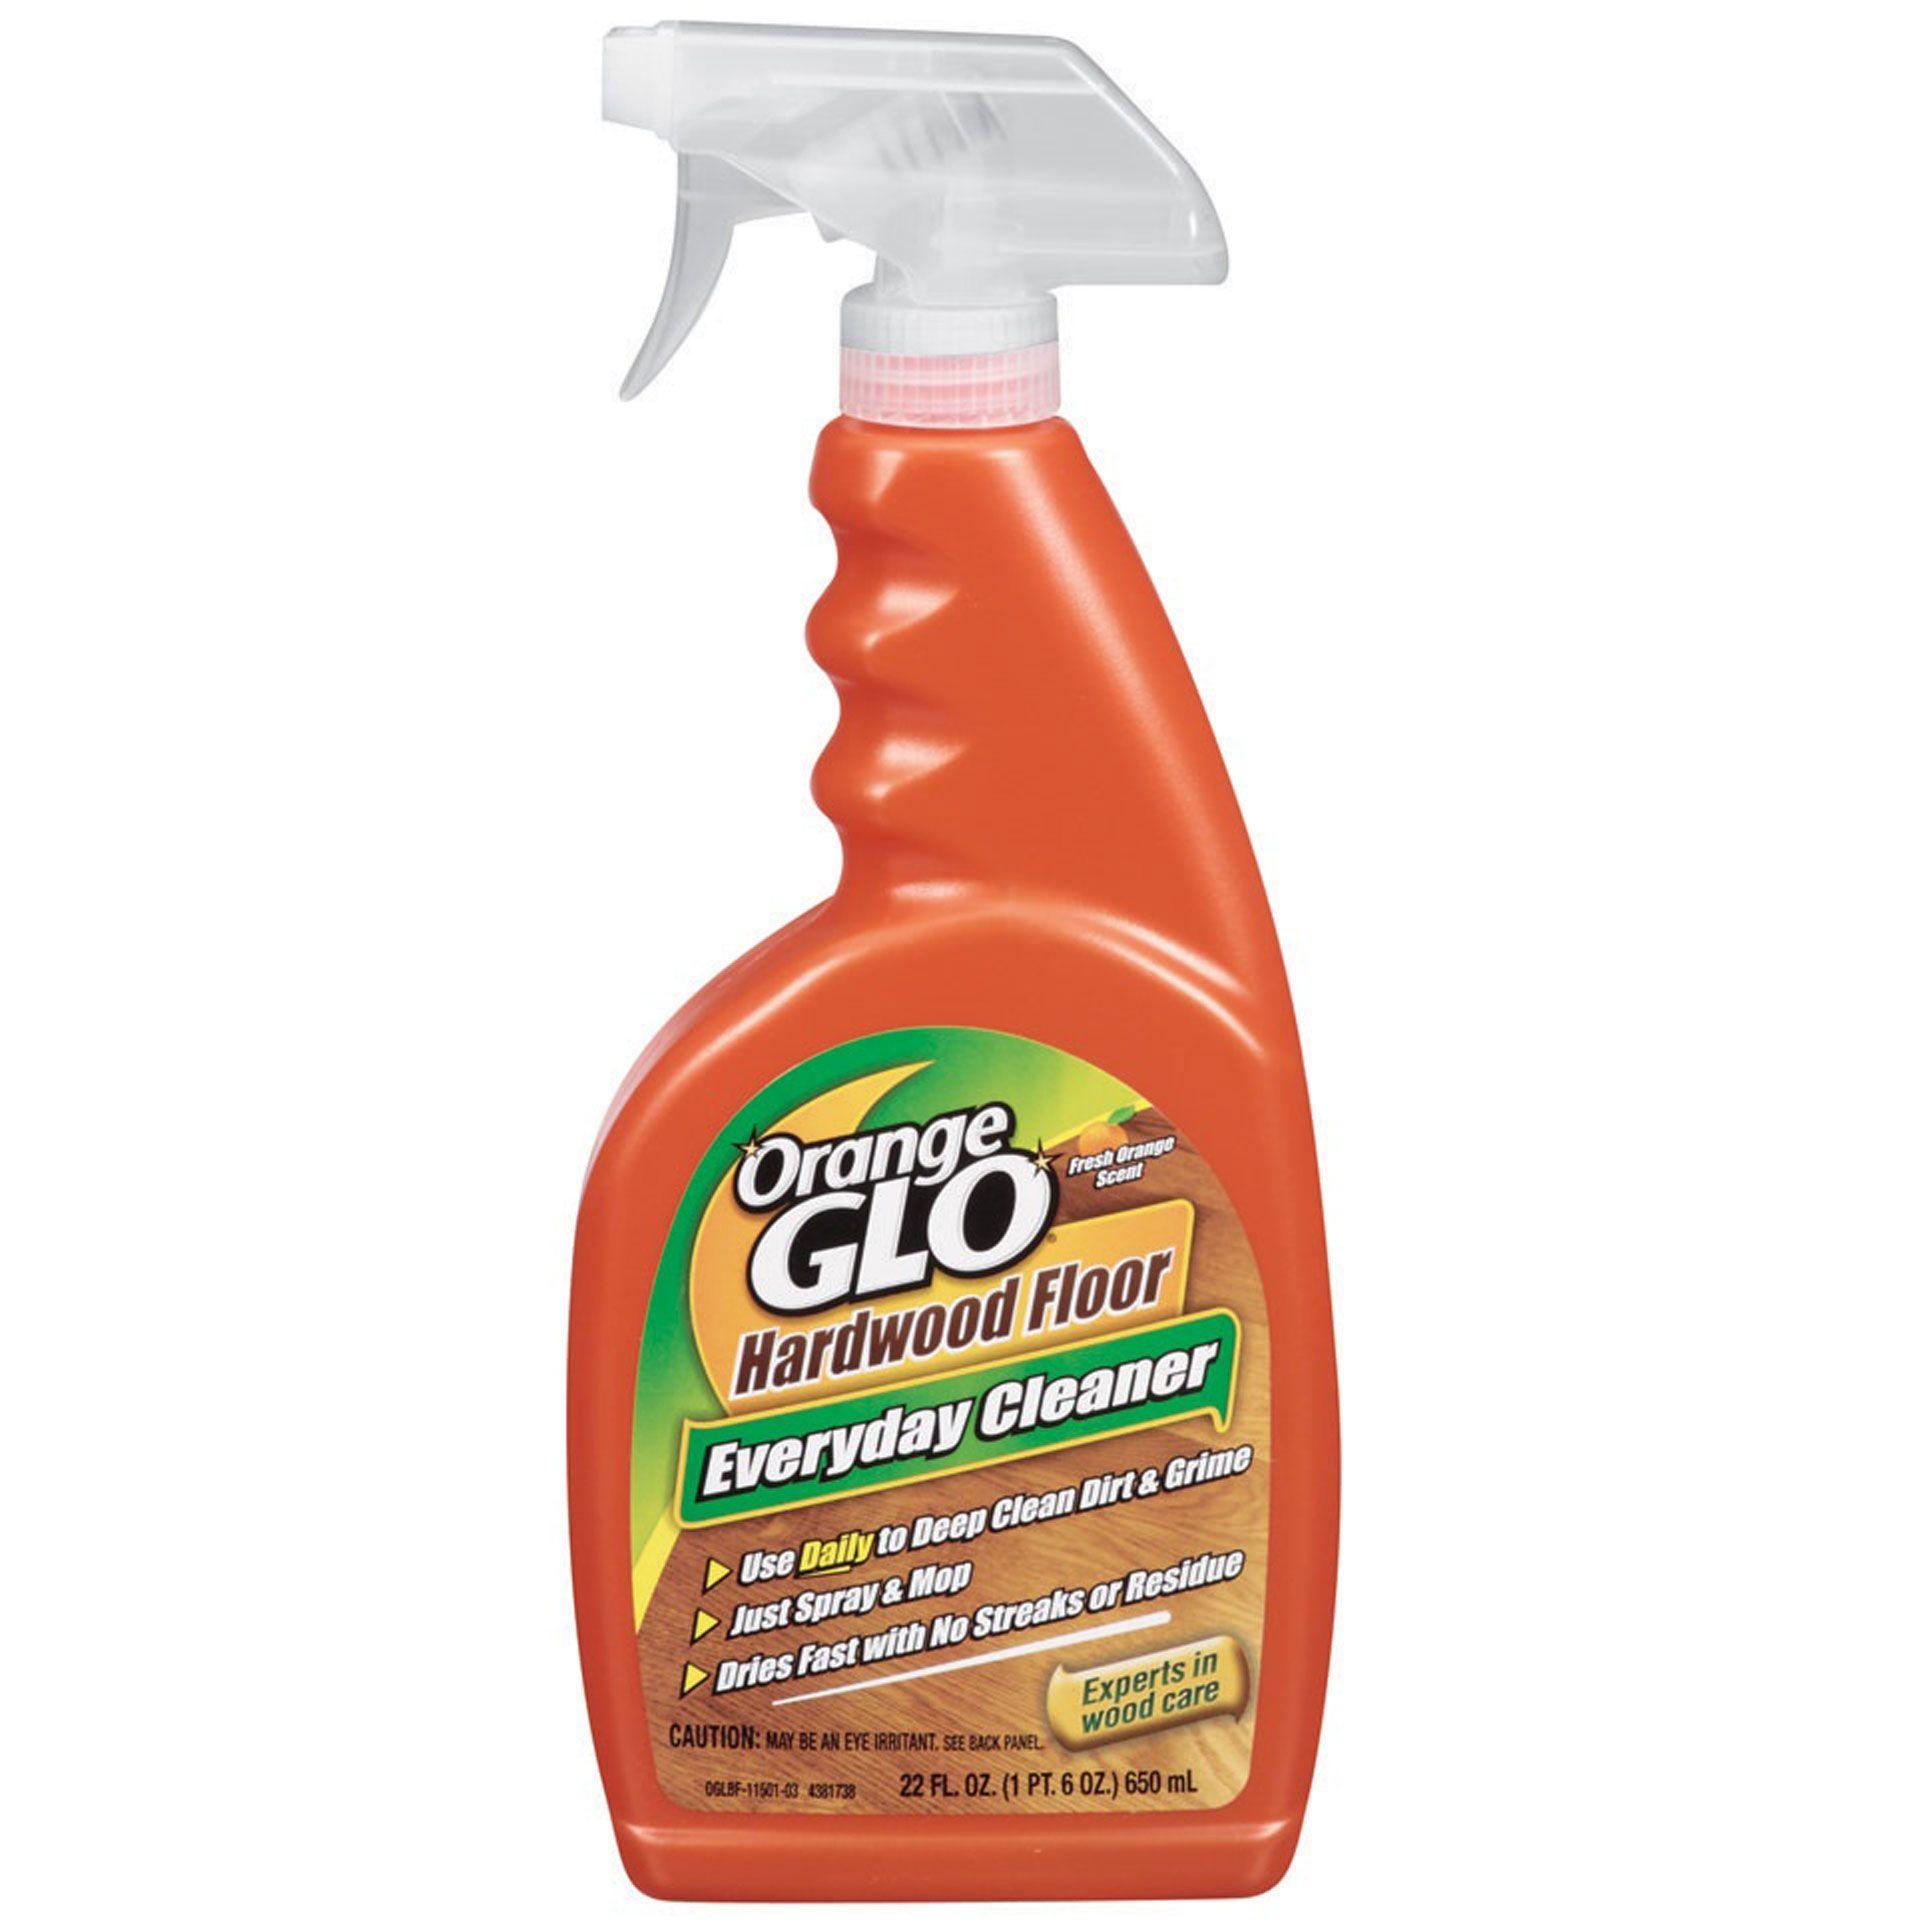 Orange Glo Hardwood Floor Everyday